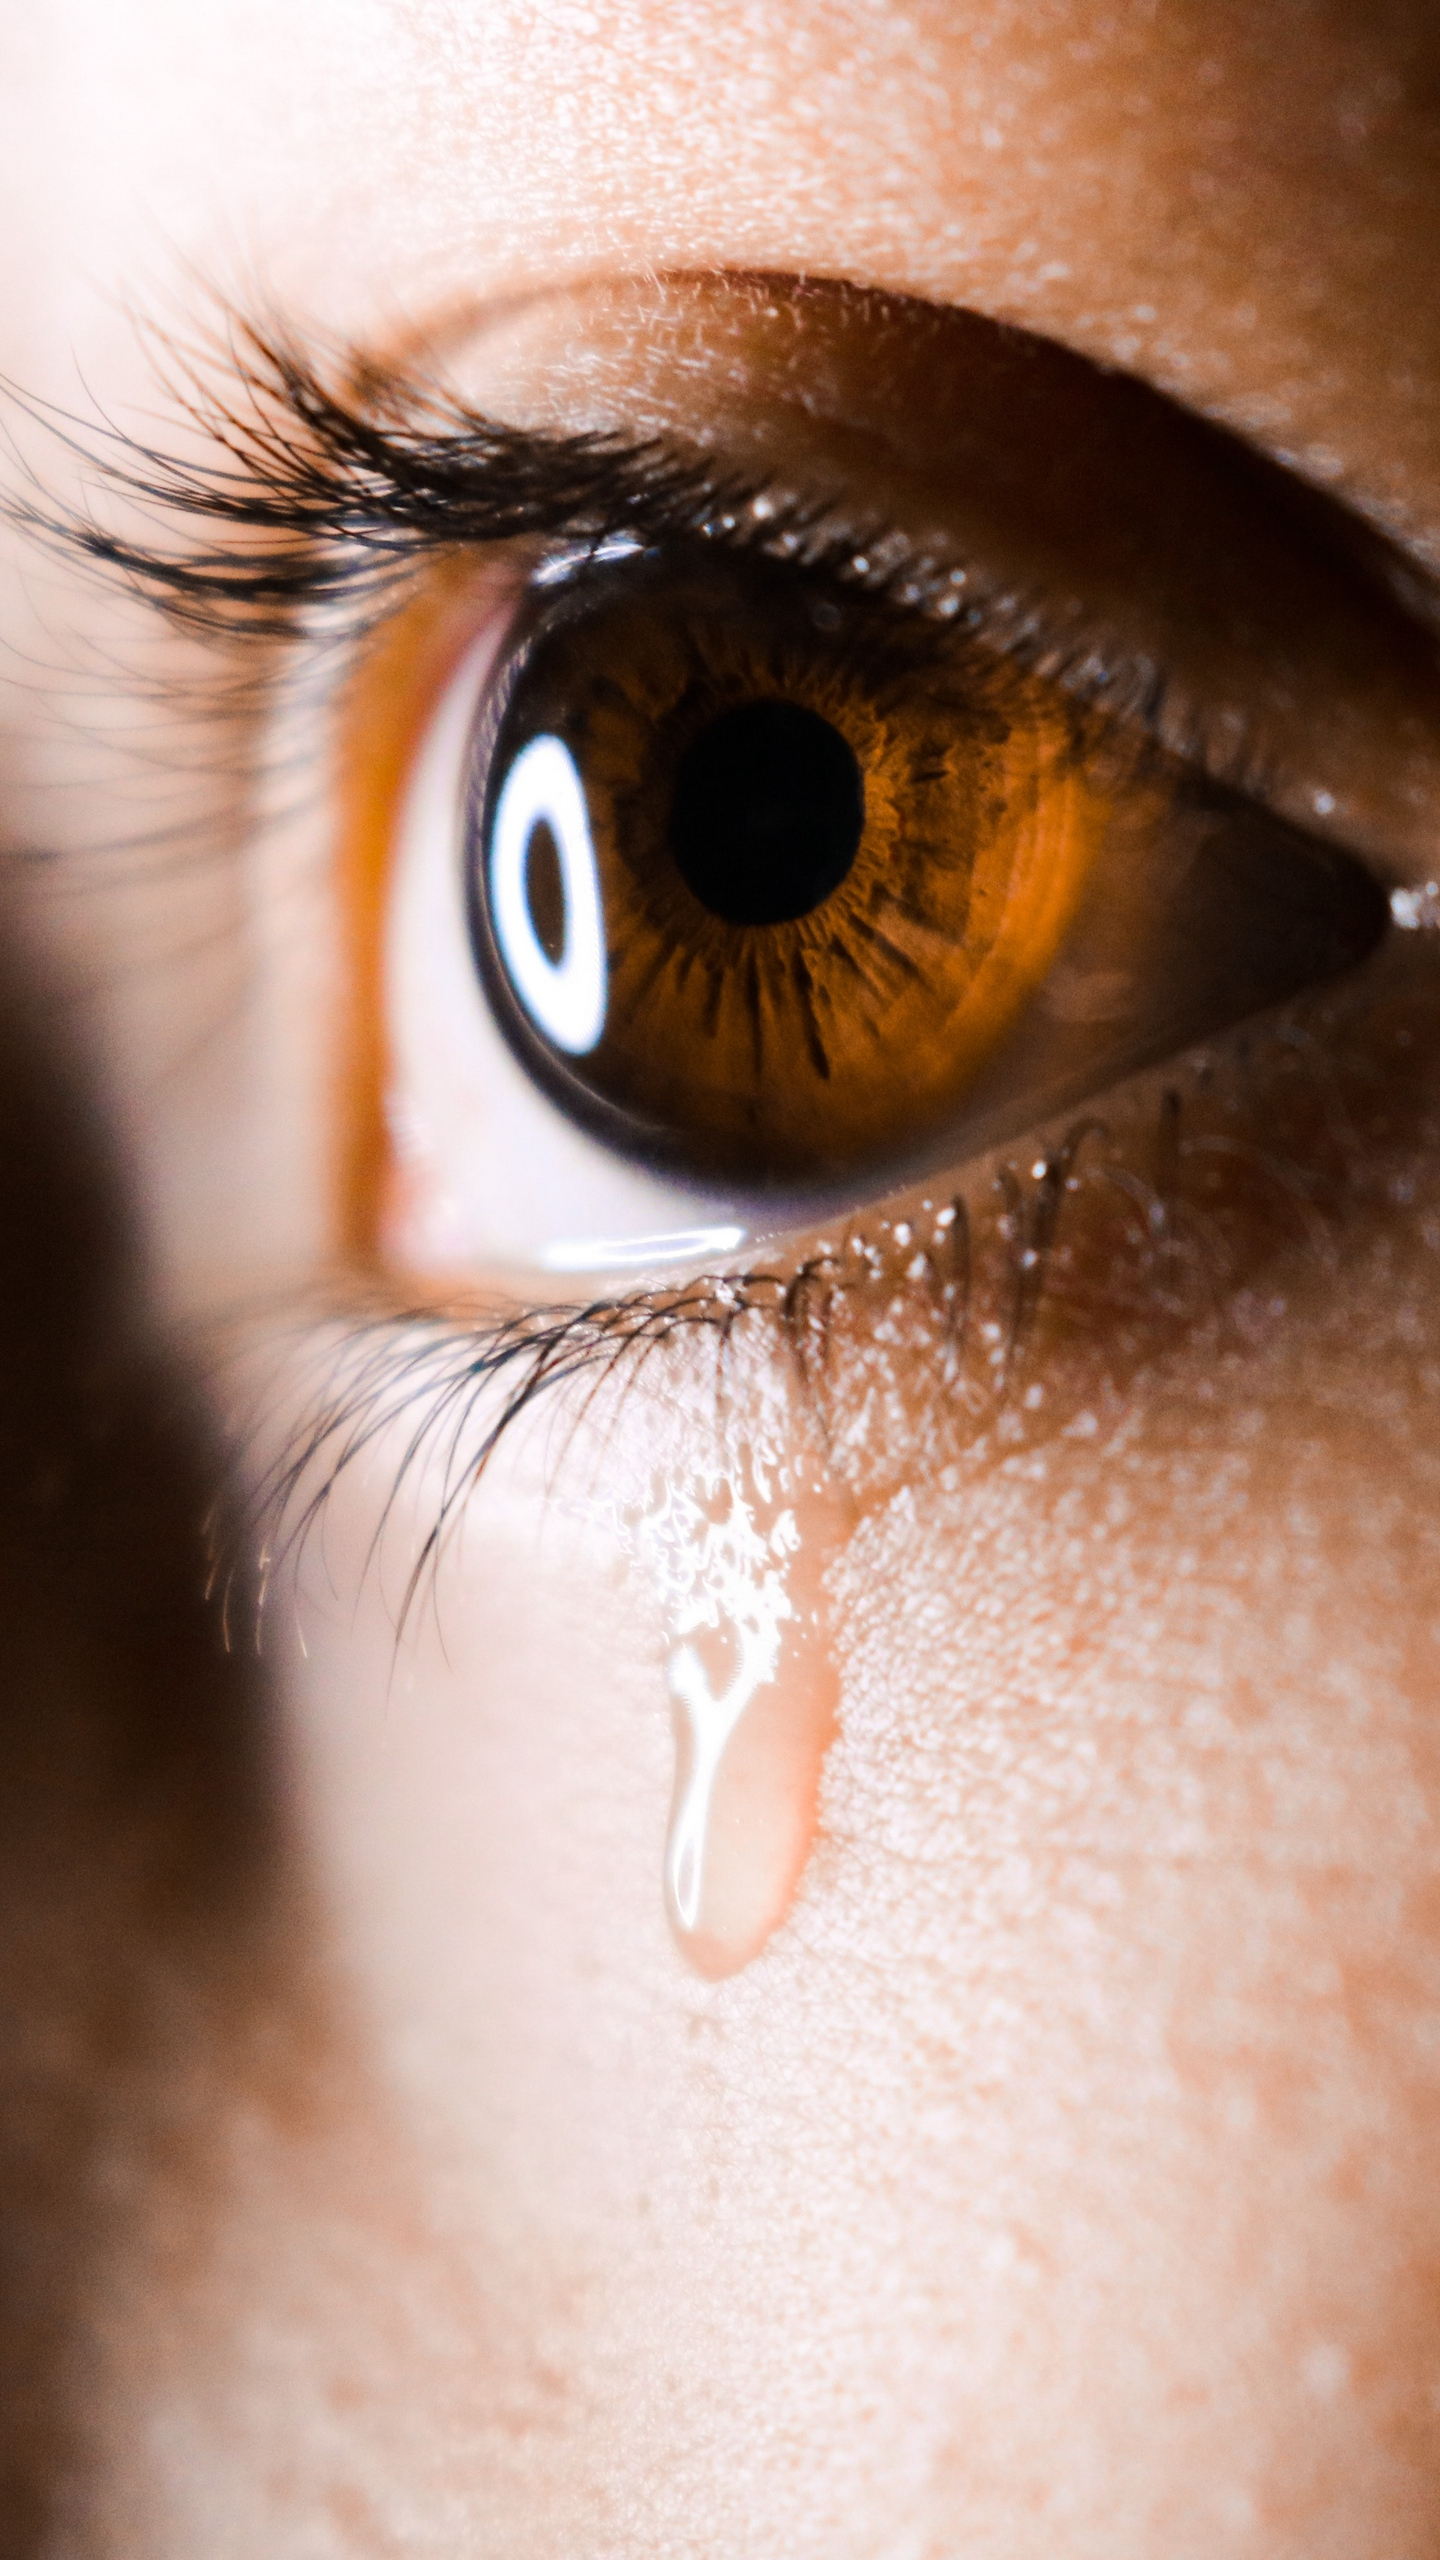 Tears Wallpaper Hd Sad Eye Images Hd 3090986 Hd Wallpaper Backgrounds Download